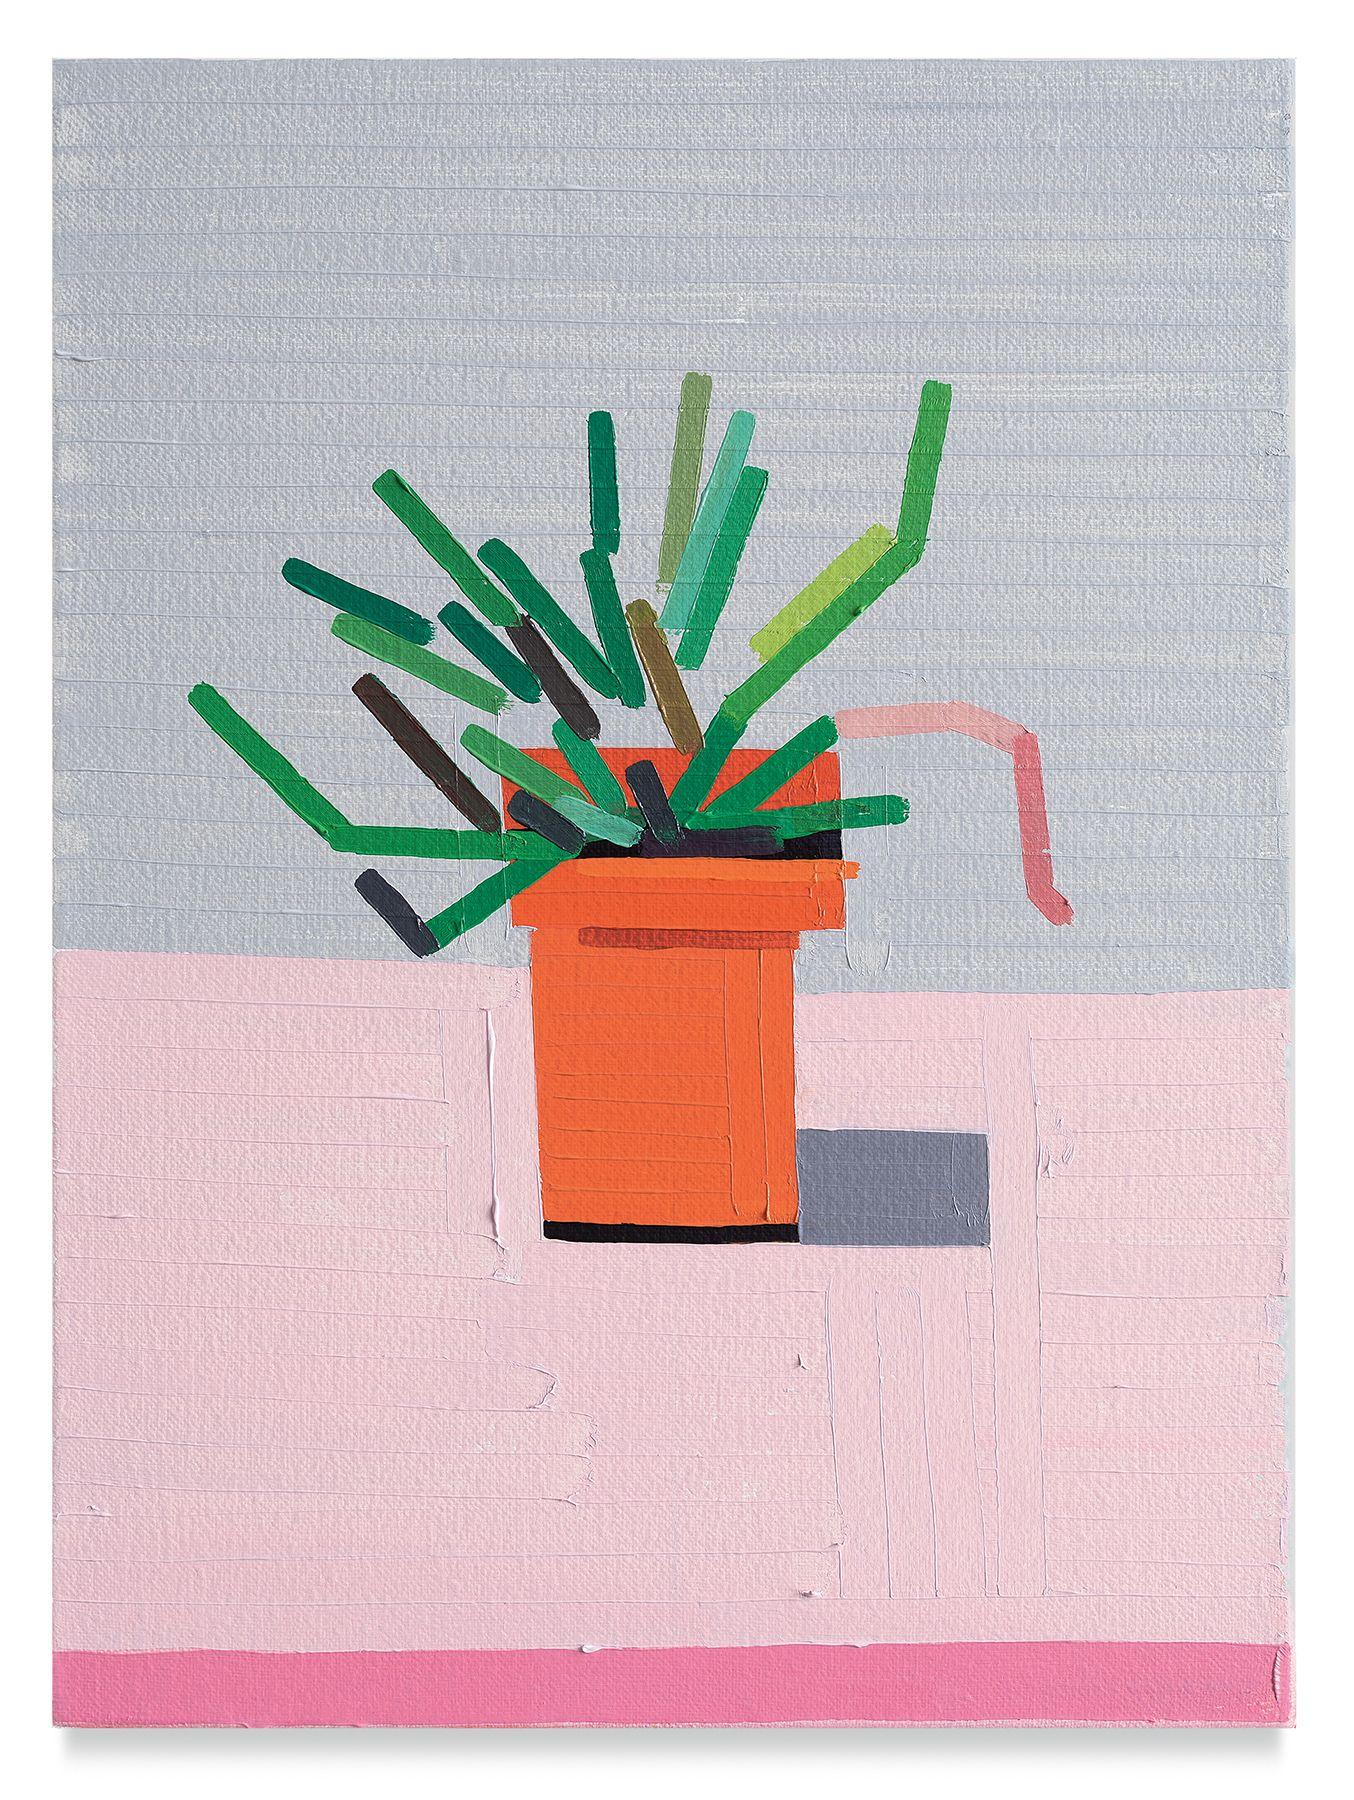 Guy Yanai, Lost Friend Plant, 2019